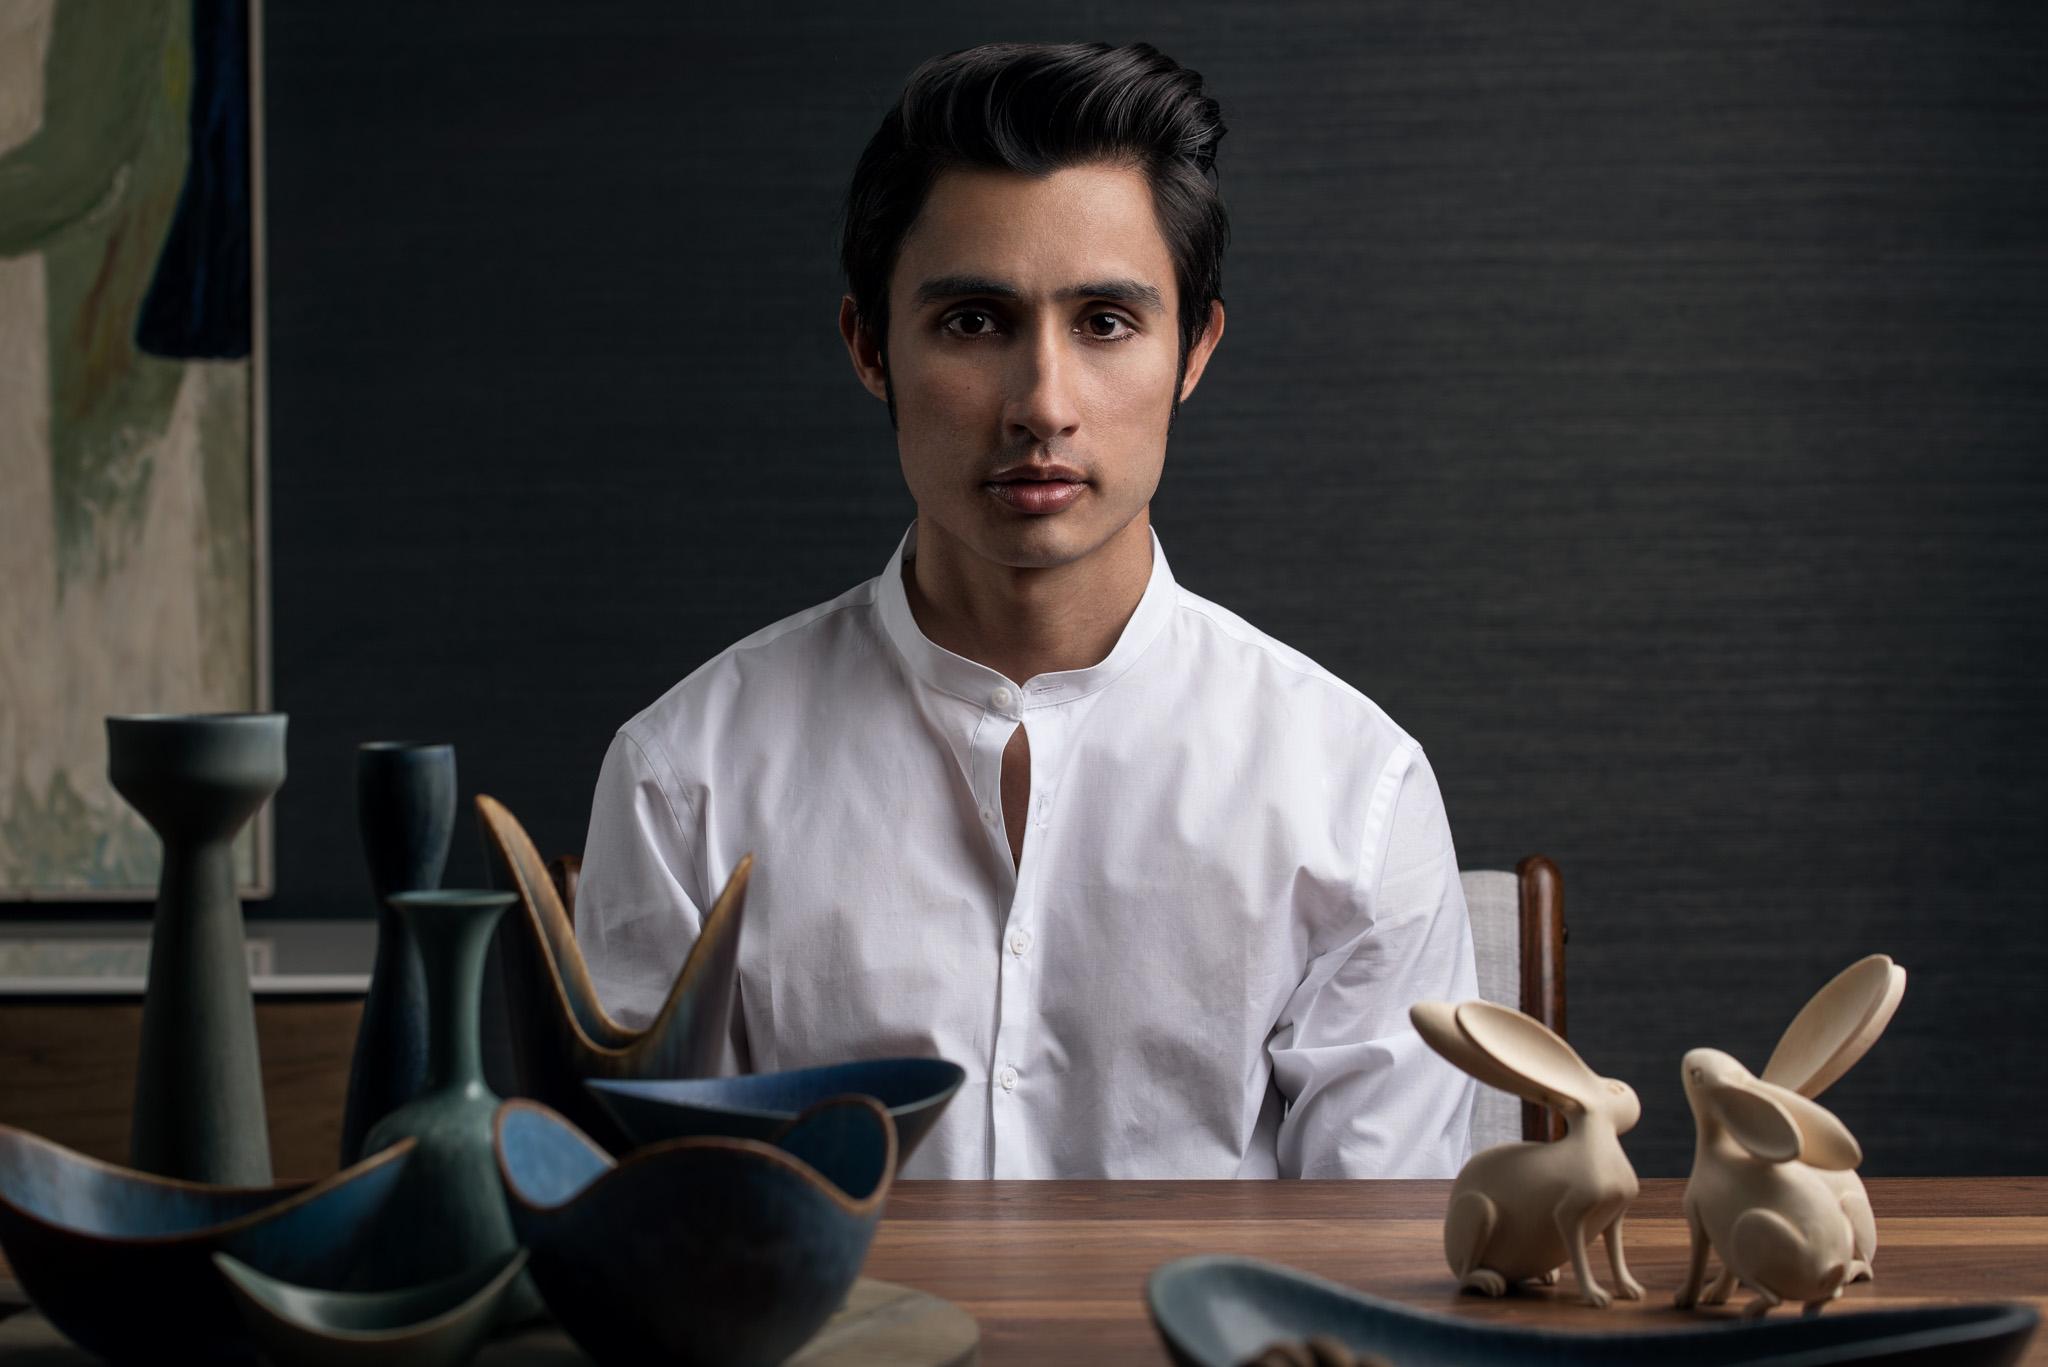 Diego-Alejandro-434.jpg